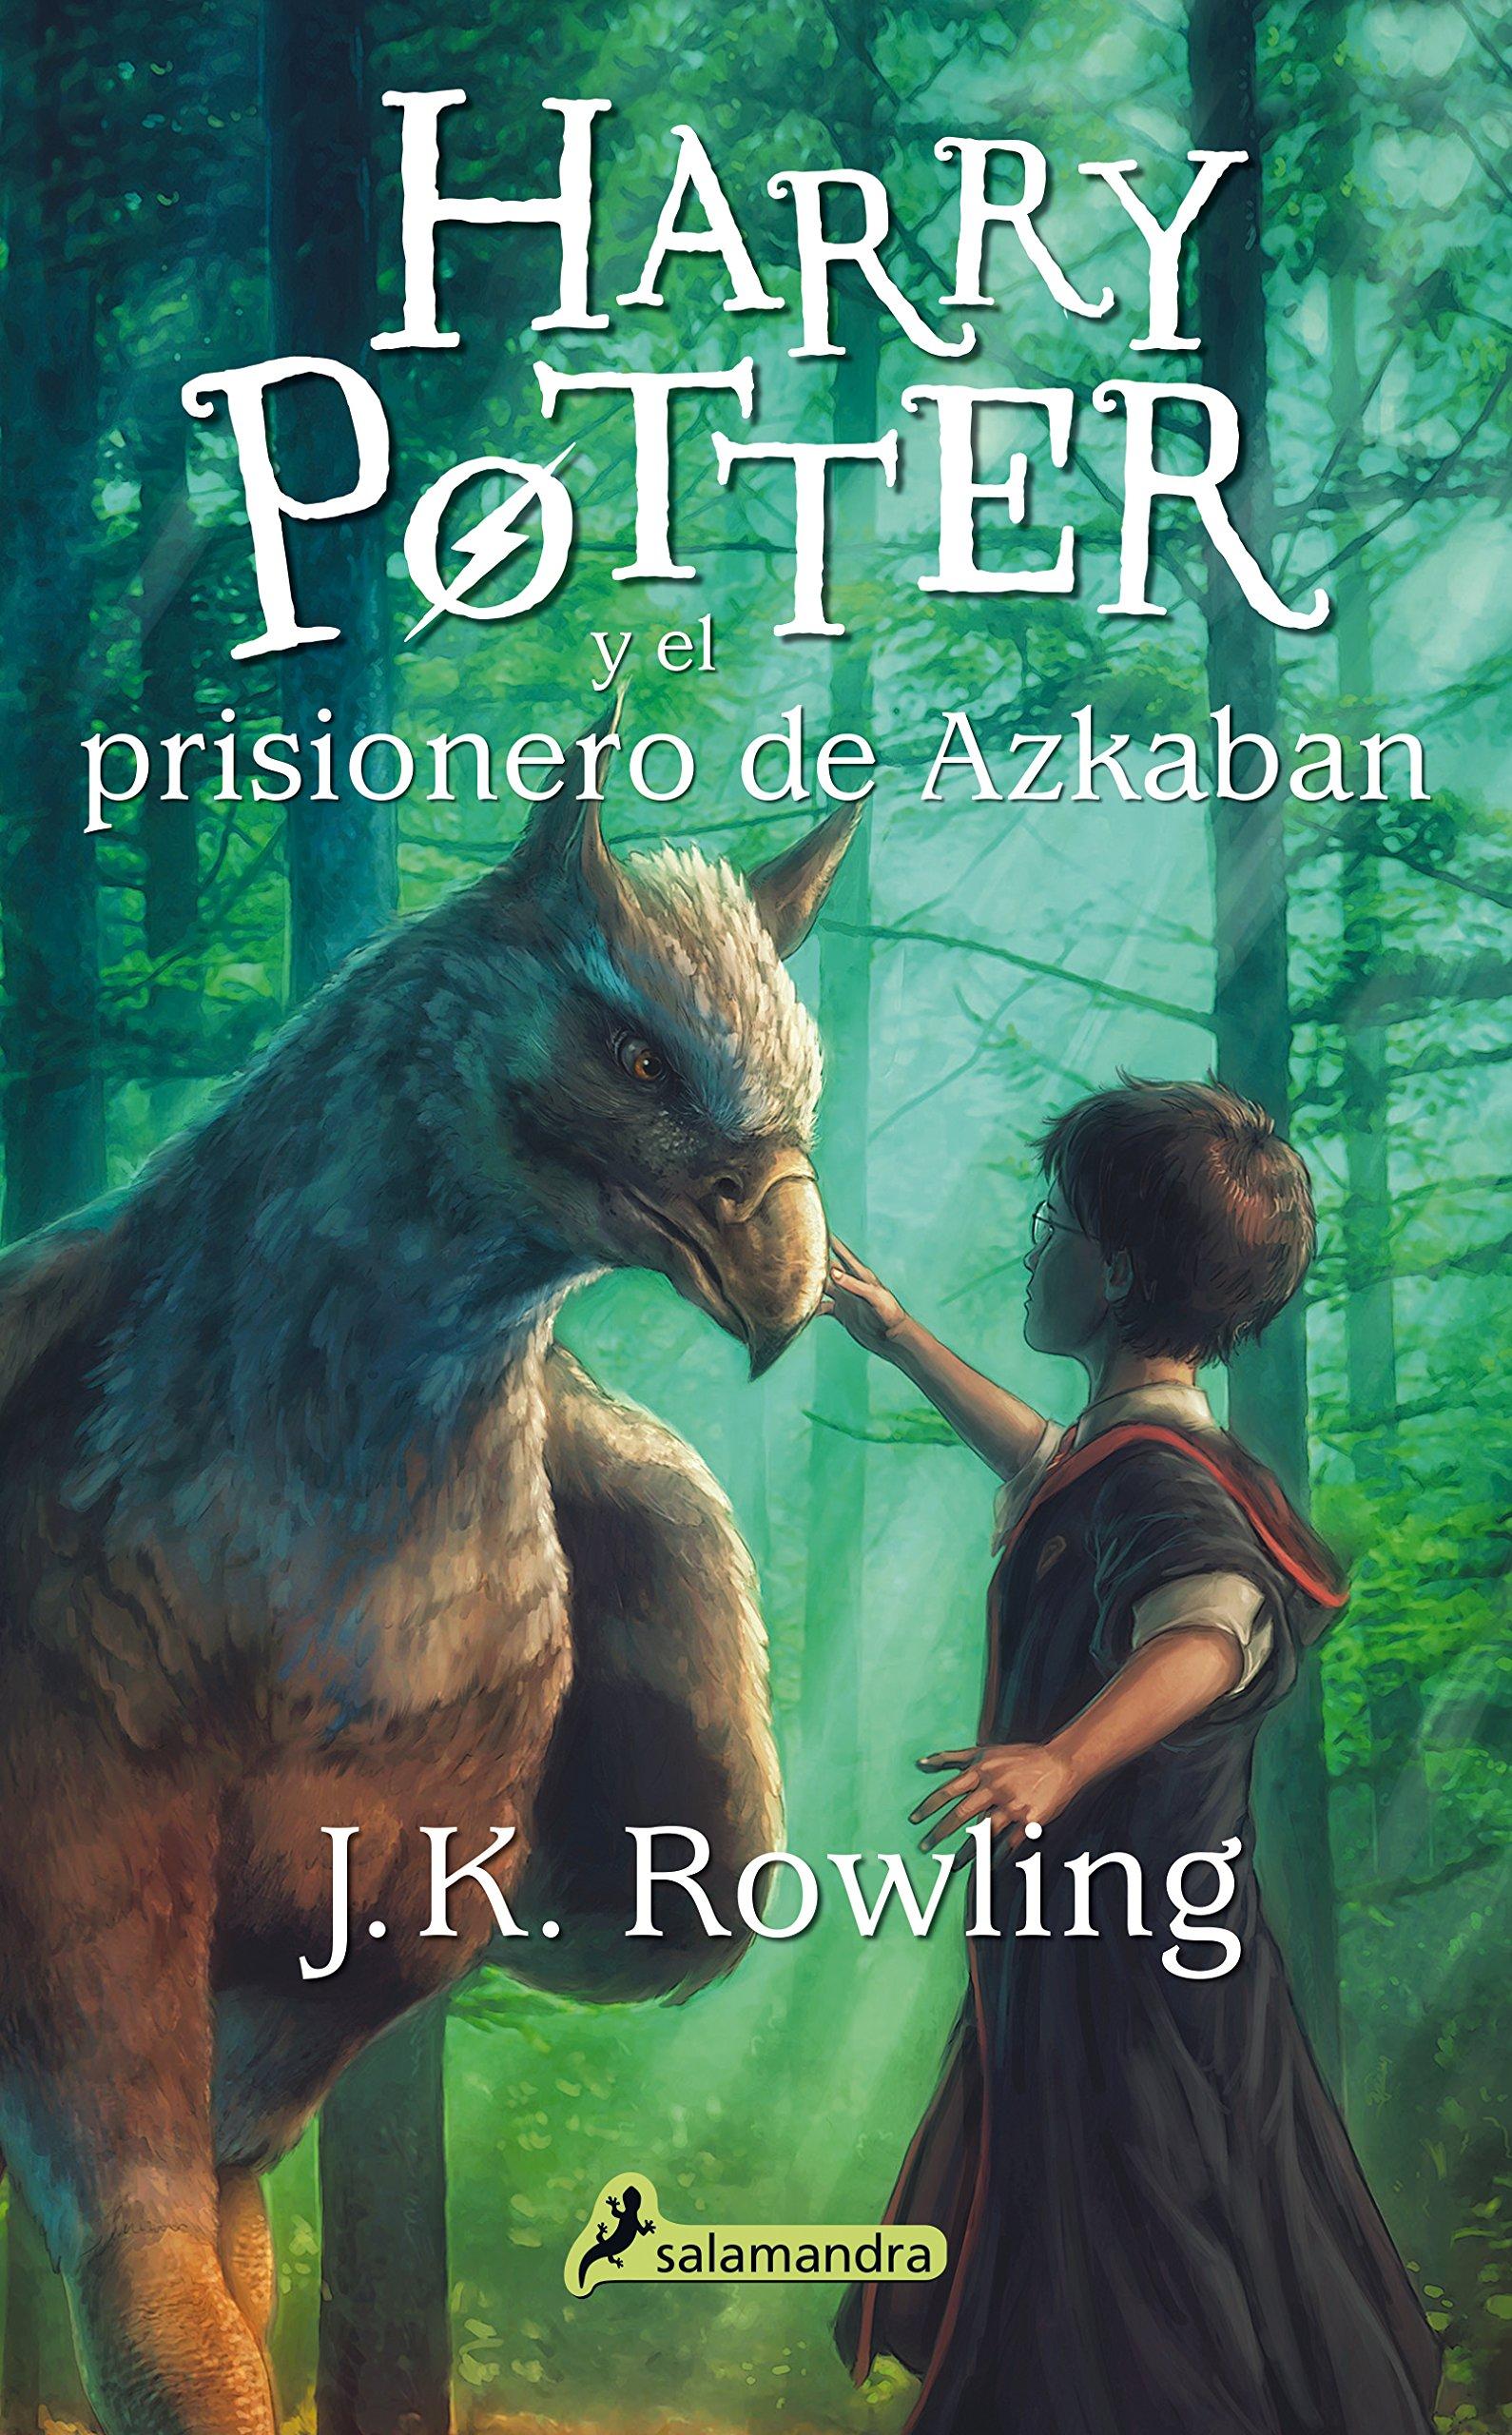 Harry Potter Y El Prisionero De Azkaban Harry Potter 3 Rowling J K 9788498386332 Amazon Com Books